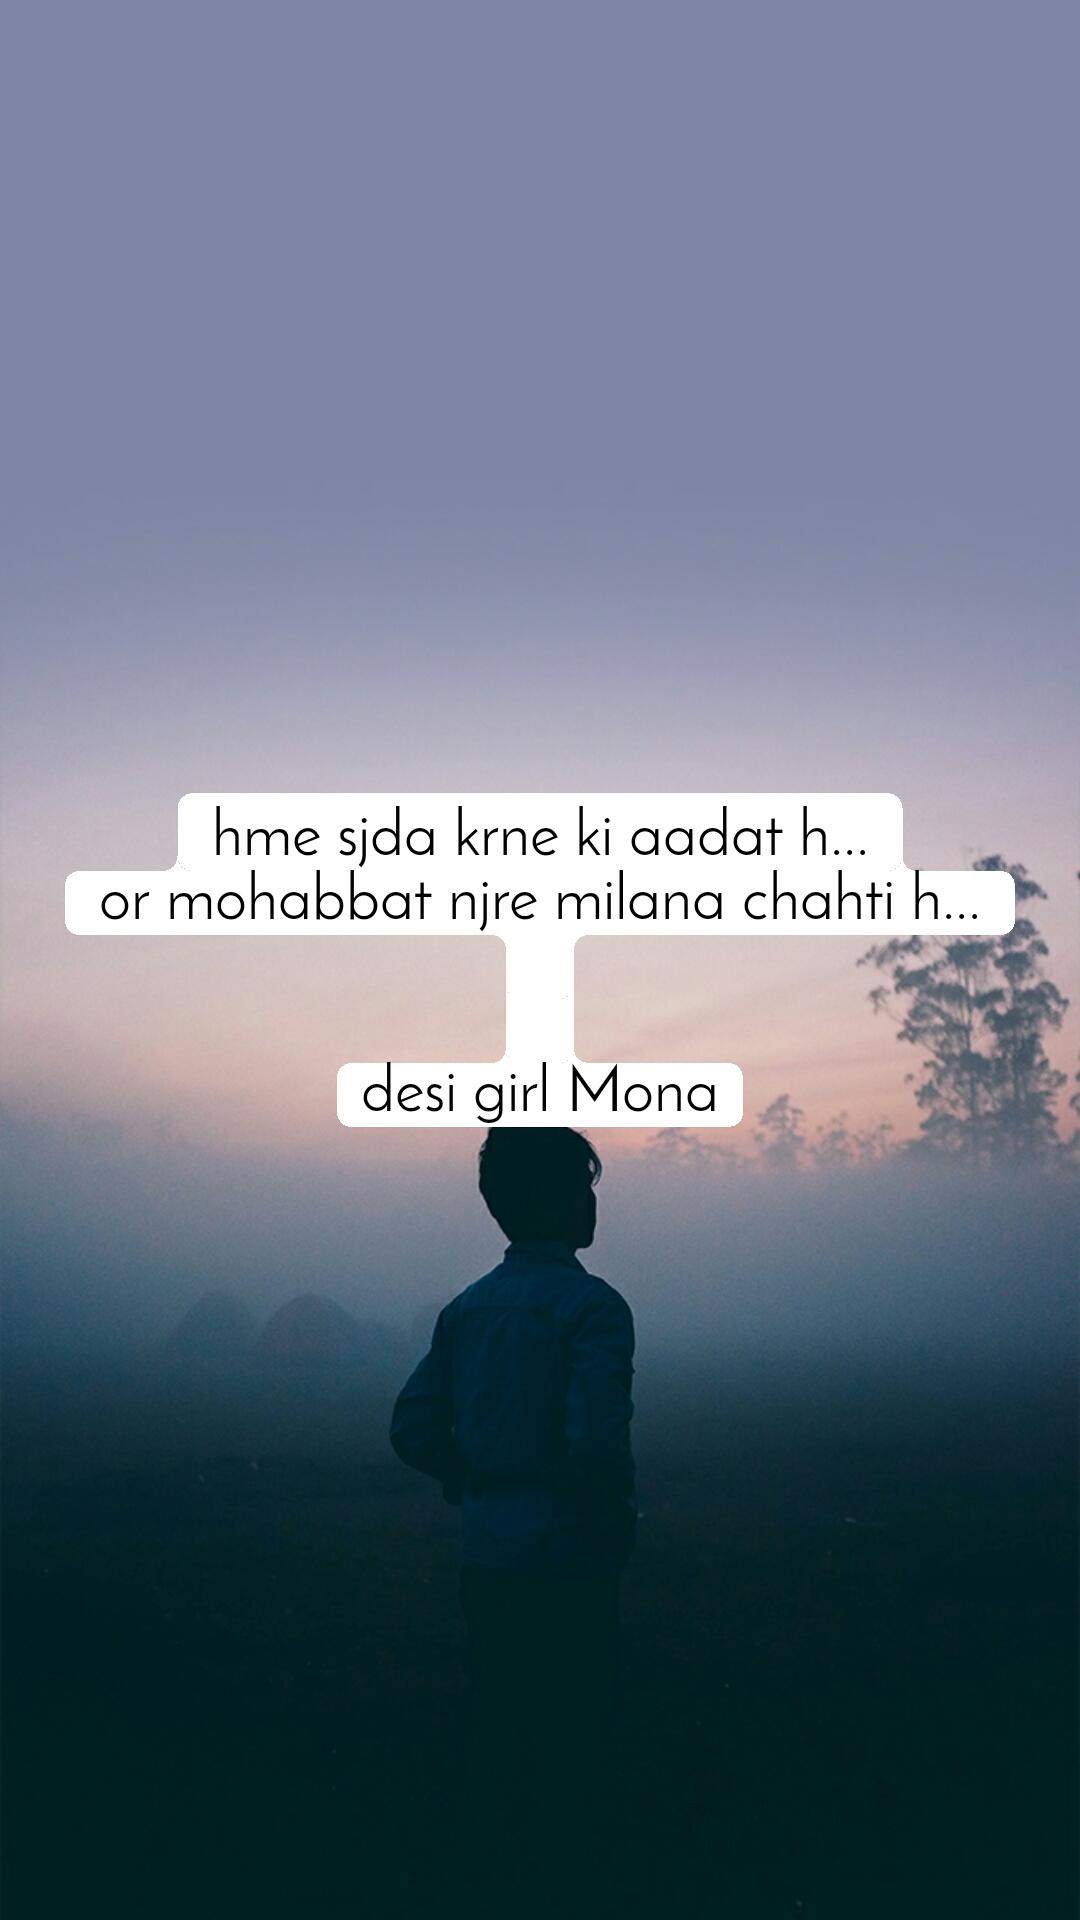 hme sjda krne ki aadat h... or mohabbat njre milana chahti h...   desi girl Mona